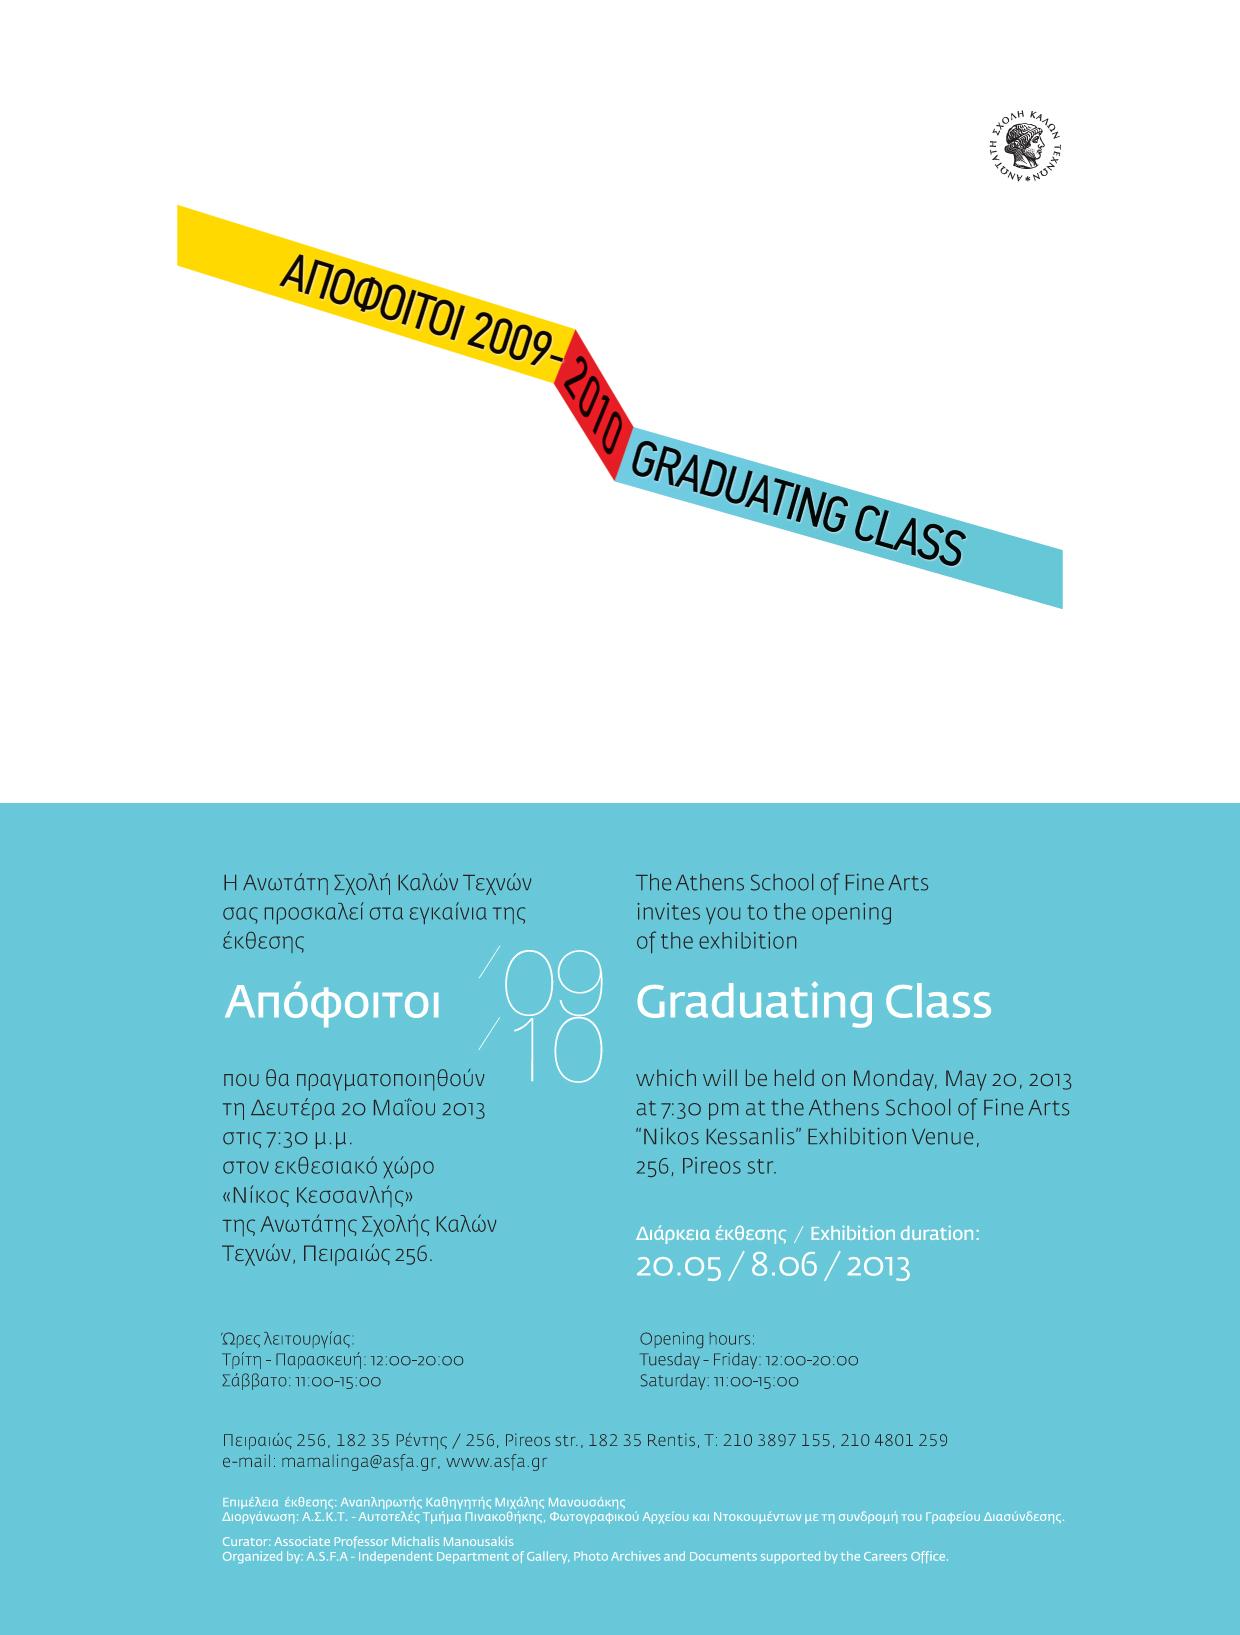 Graduating class 2009-2010